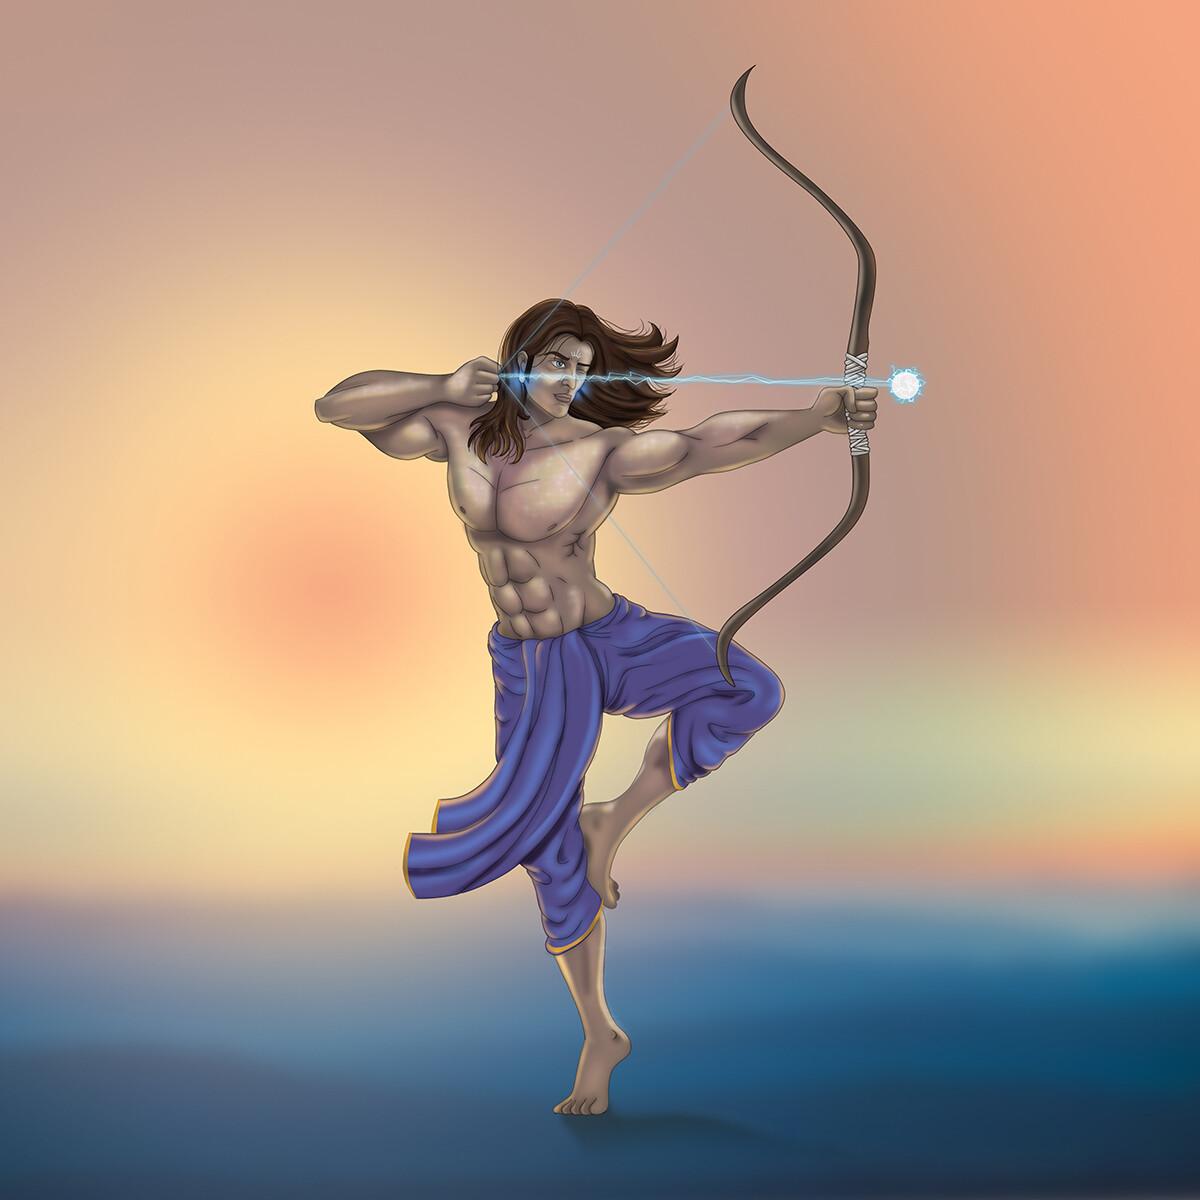 ArtStation - Karn (कर्ण), Alok Joshi